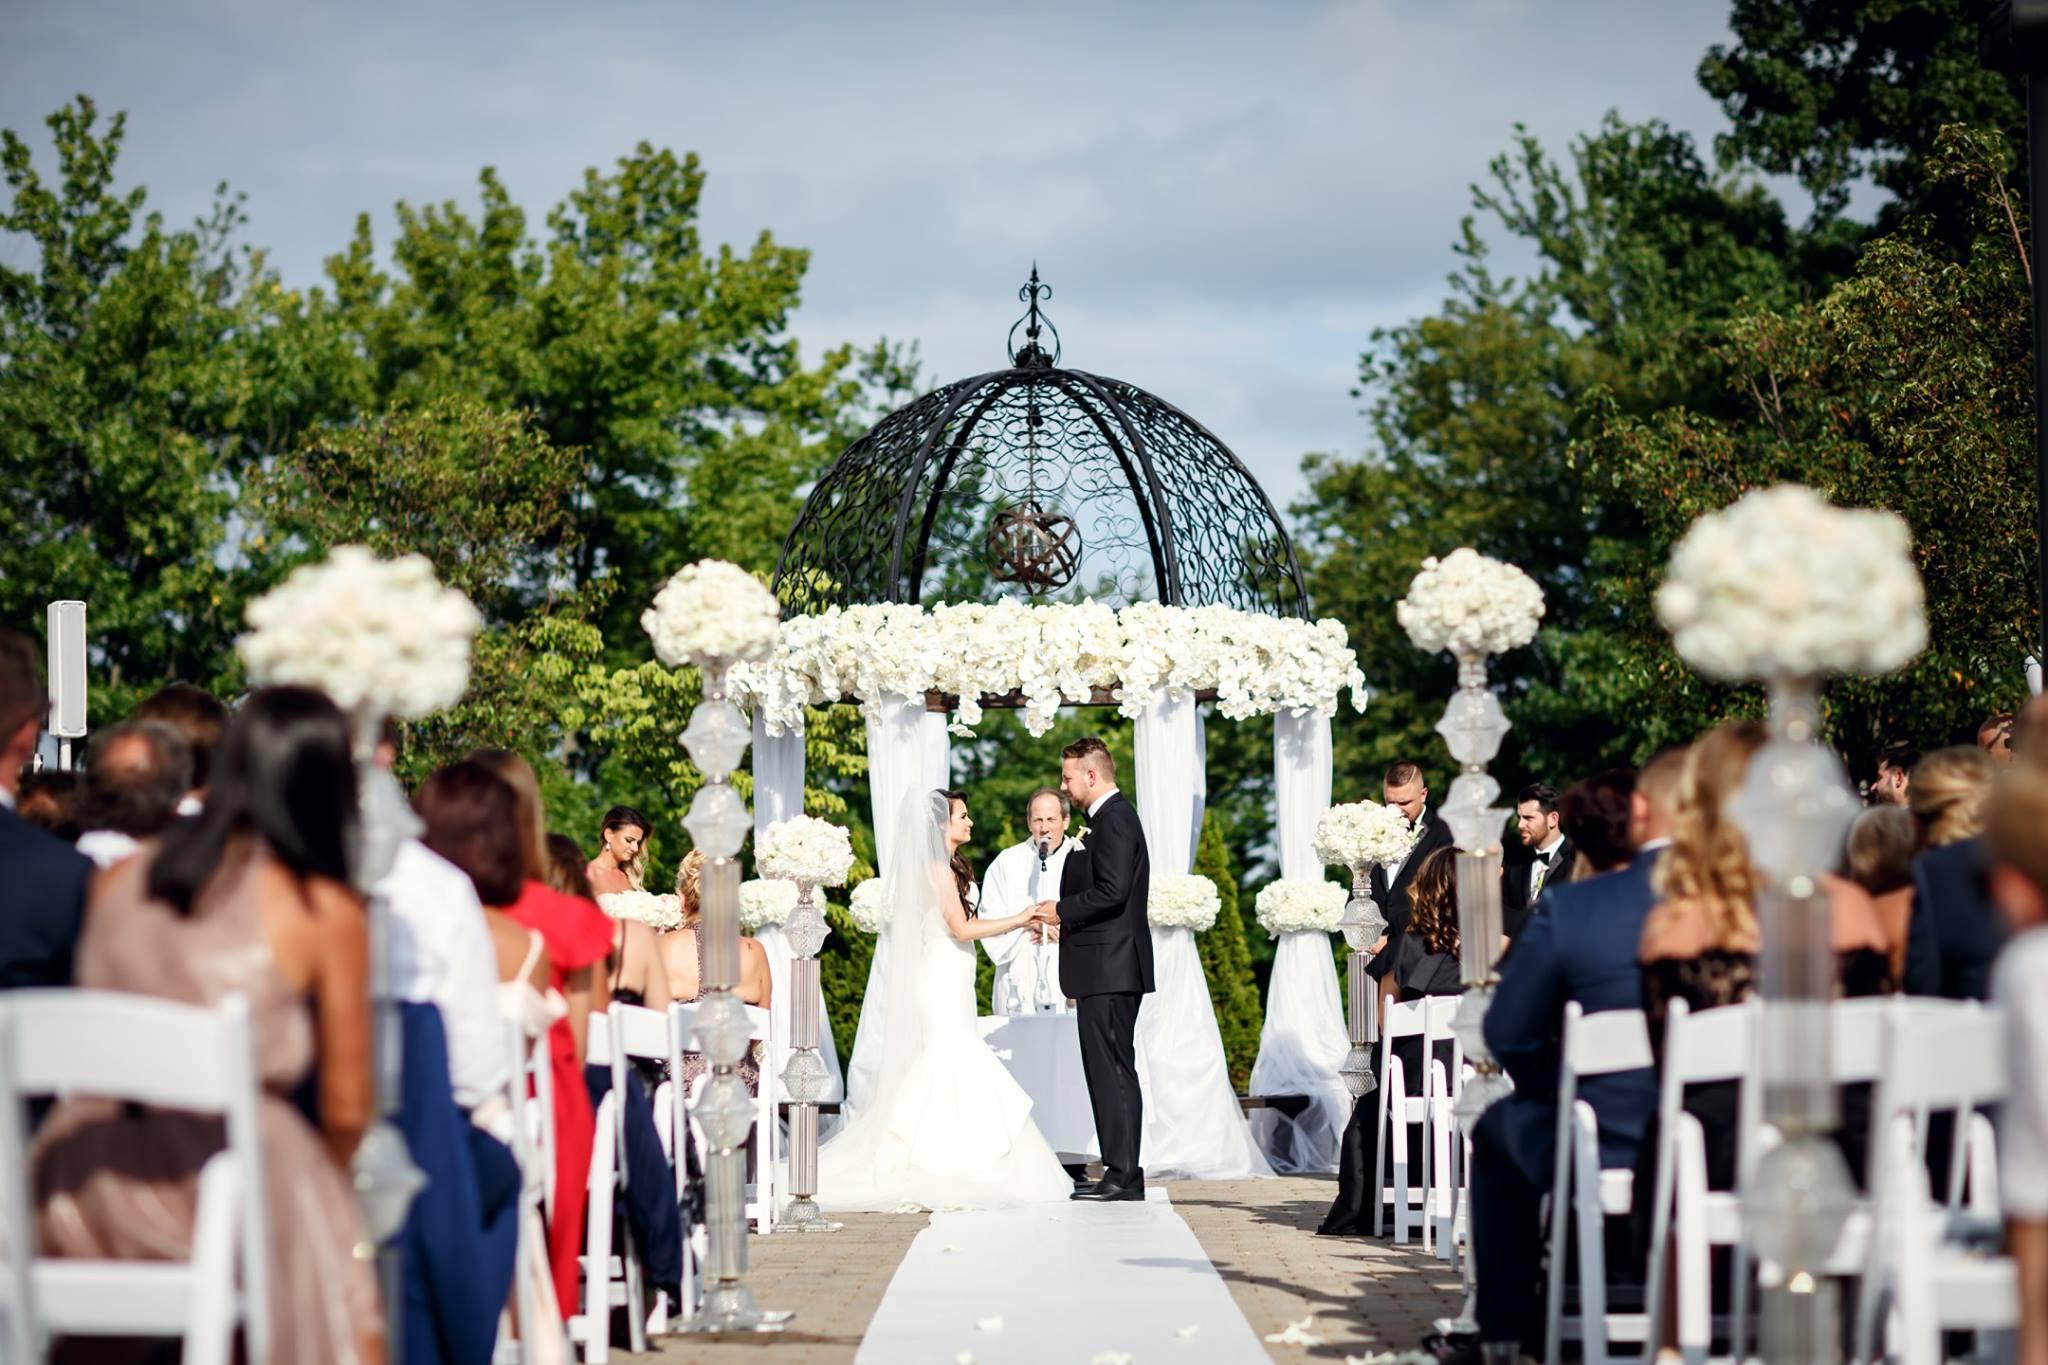 zajac photography wedding 28a